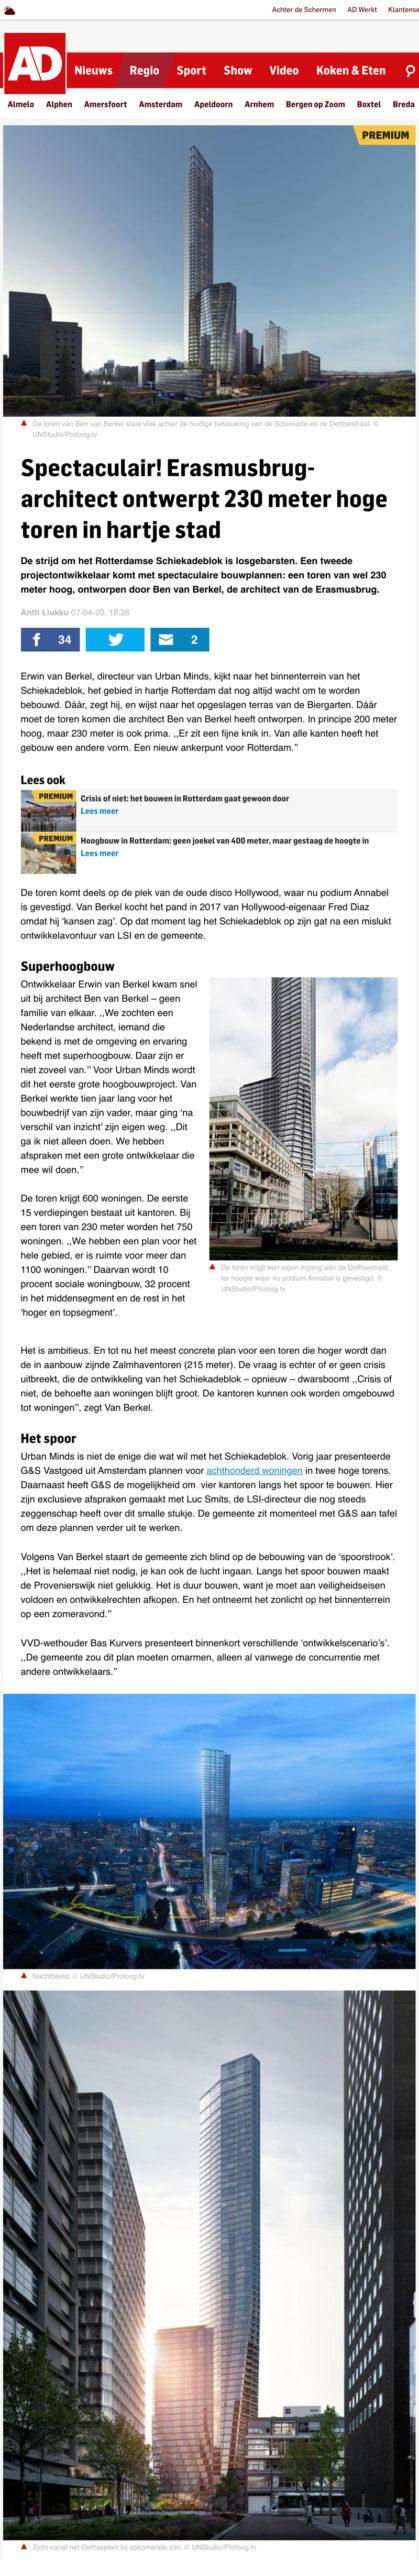 urban-minds-Schiekadeblok-Rotterdam-Algemeen-Dagblad